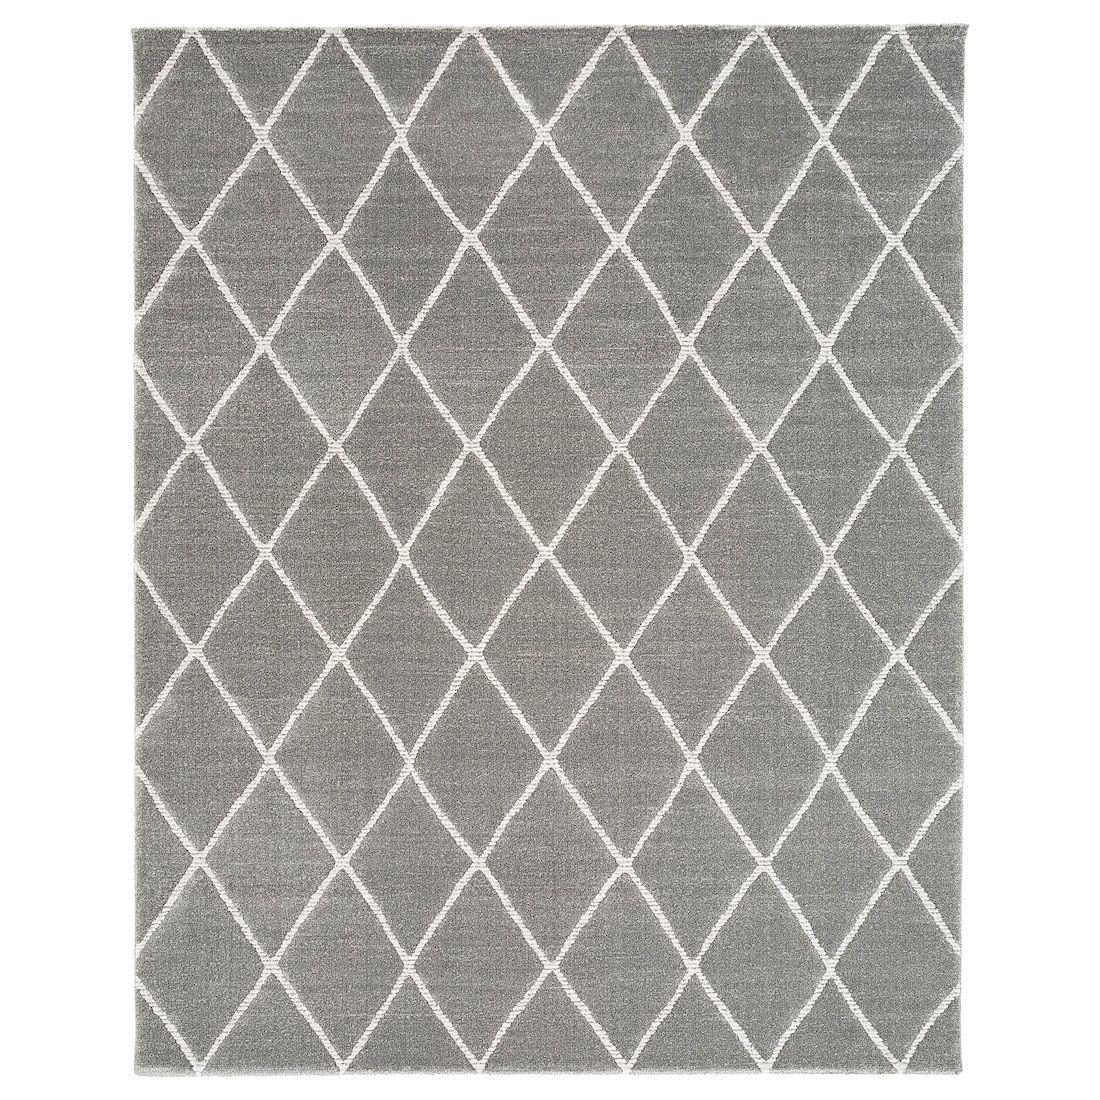 Vantore Rug Low Pile Gray White Diamond Pattern Ikea Rugs